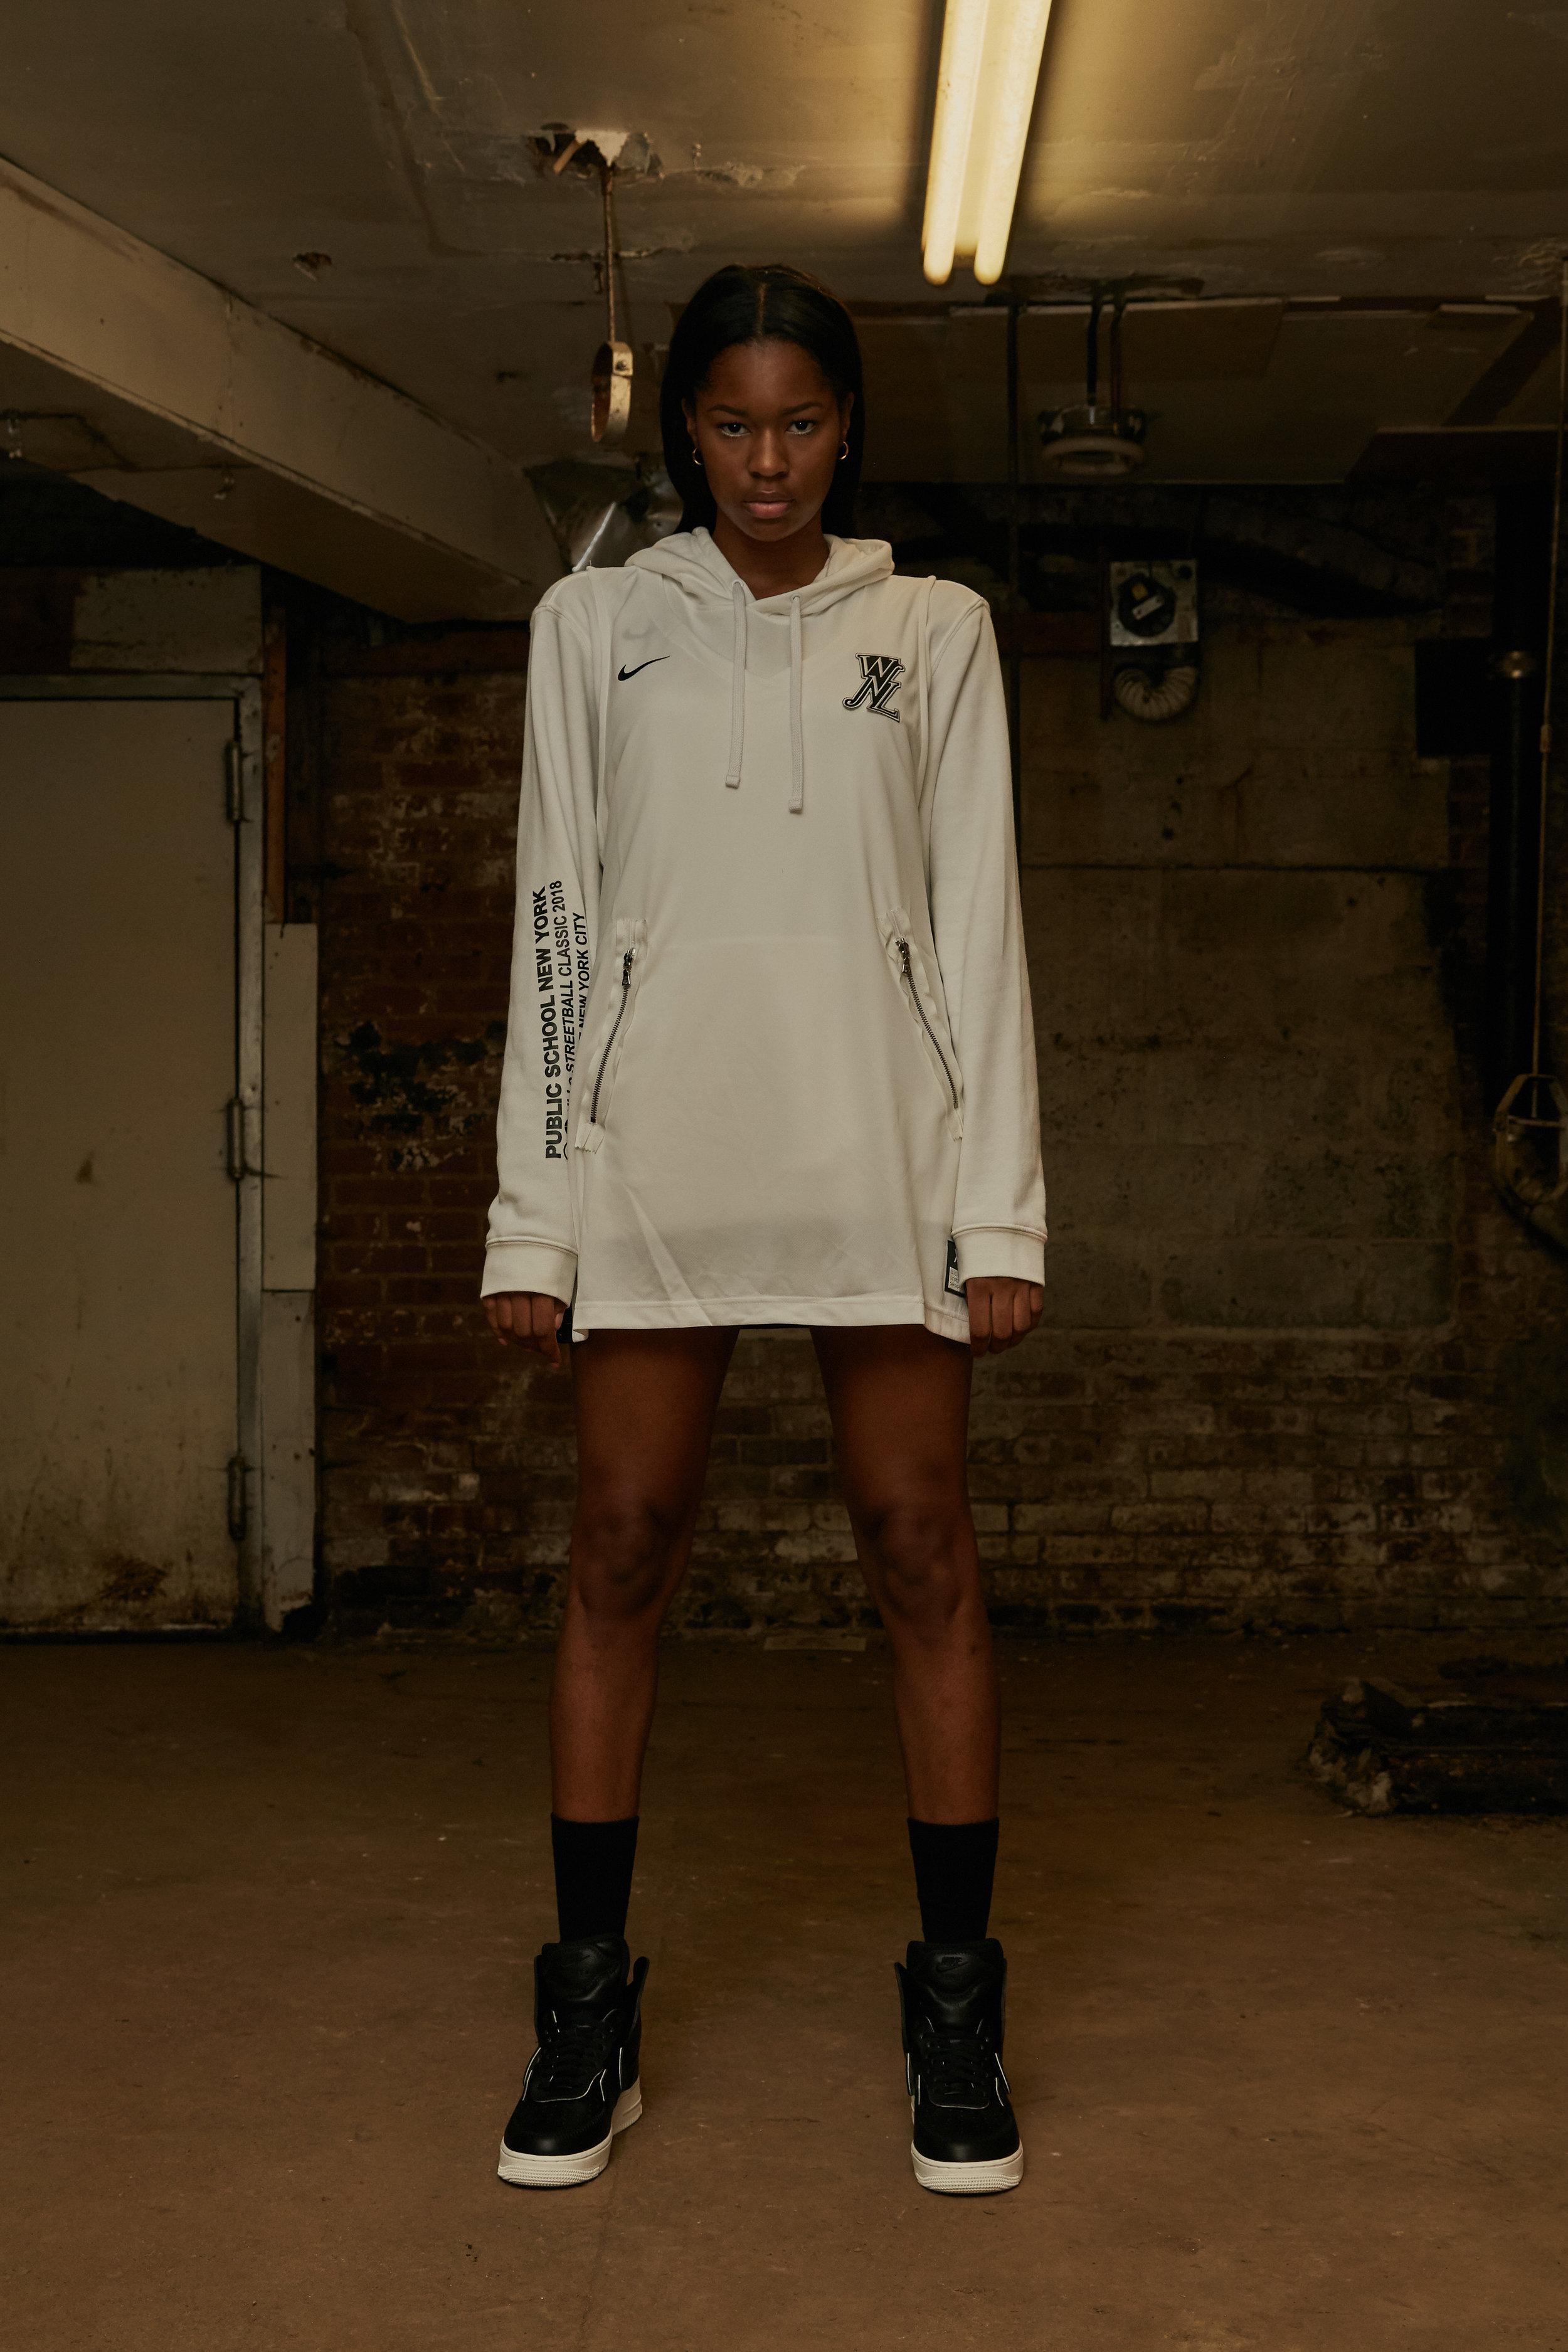 NikePSNY-product6400.jpg